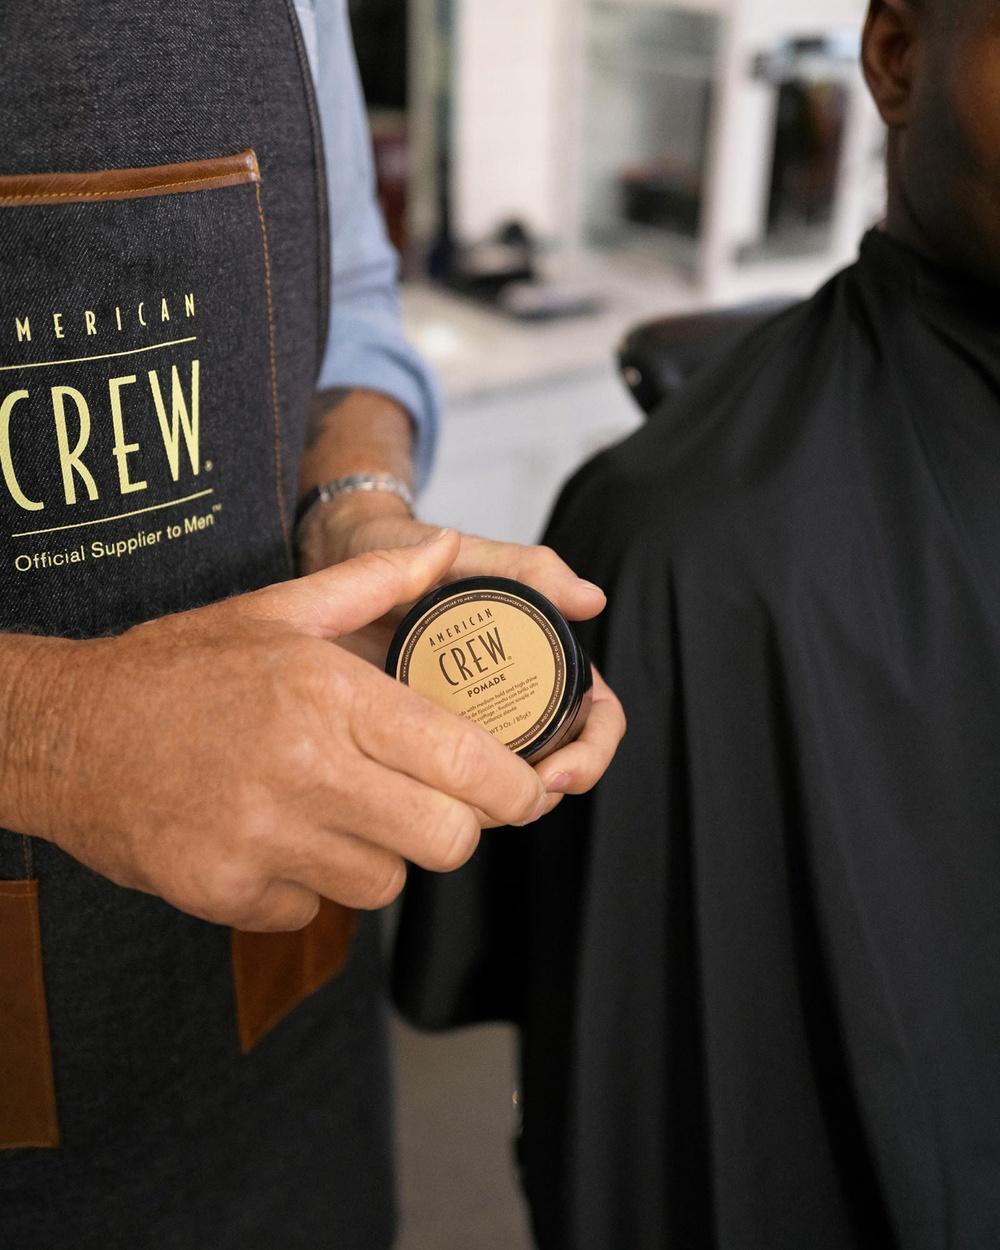 American Crew Classic Pomade 3oz 85g Beauty N/A 3oz-85g